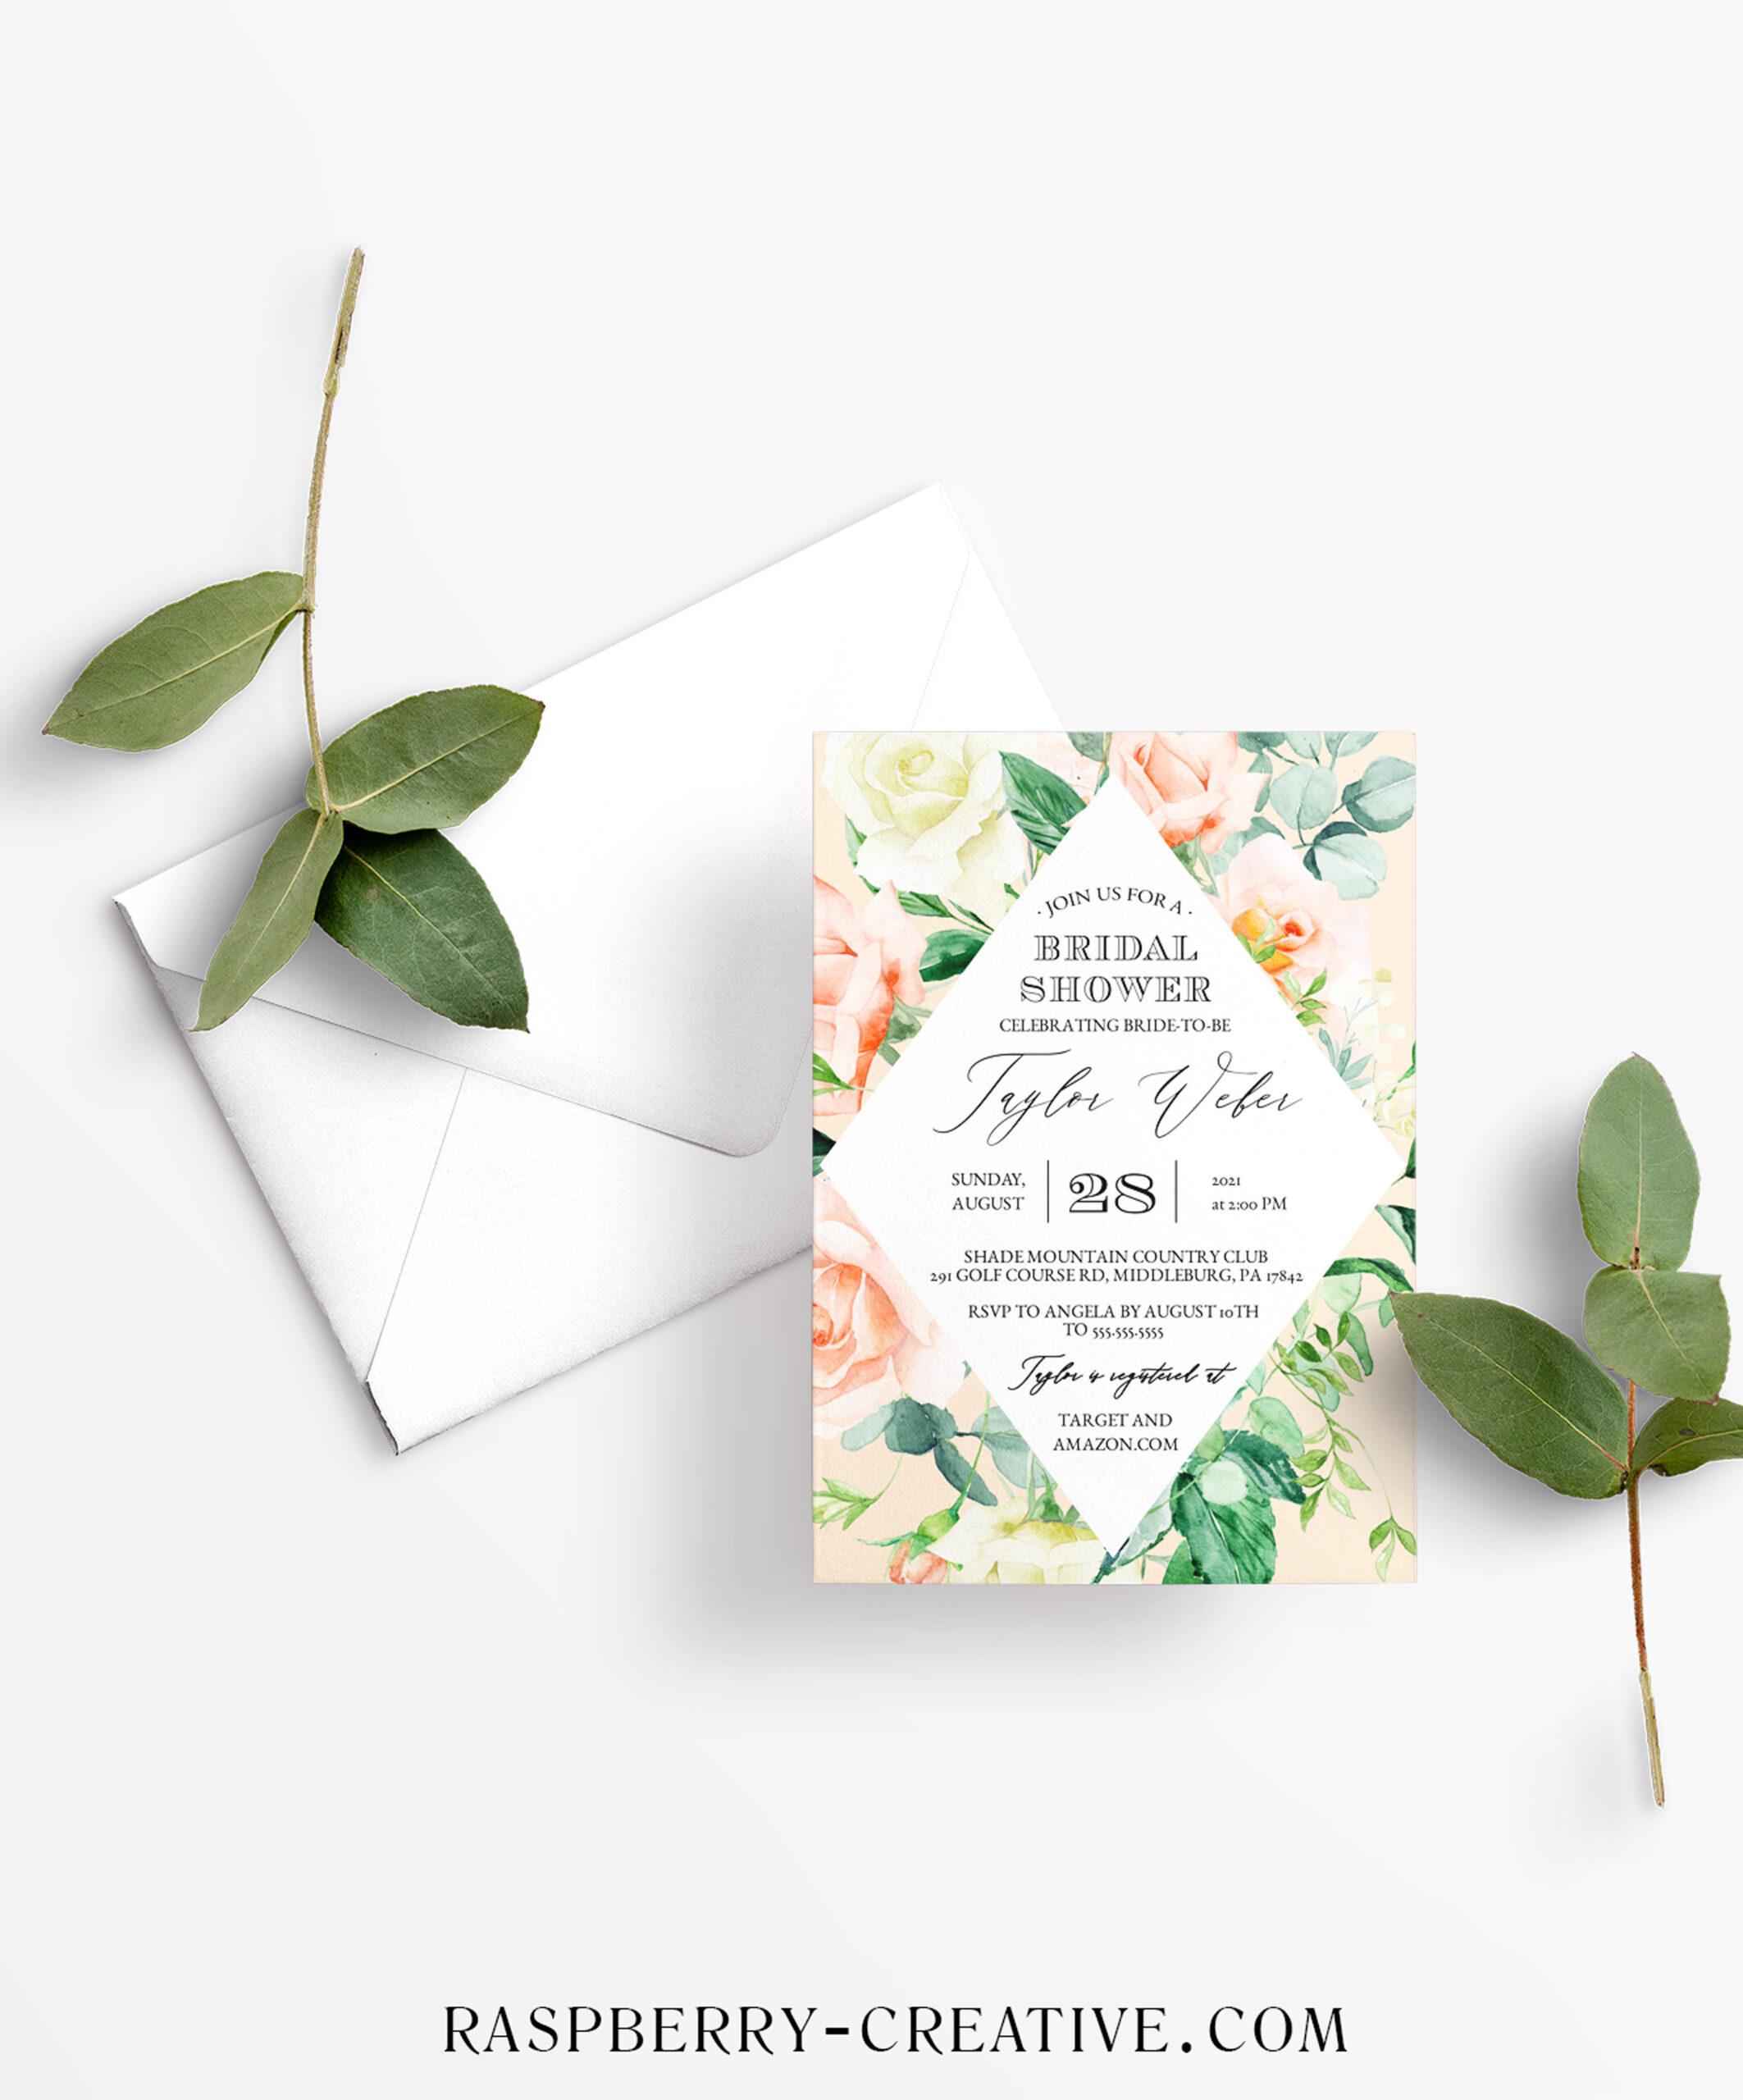 sweetest peach diamond bridal shower invitation